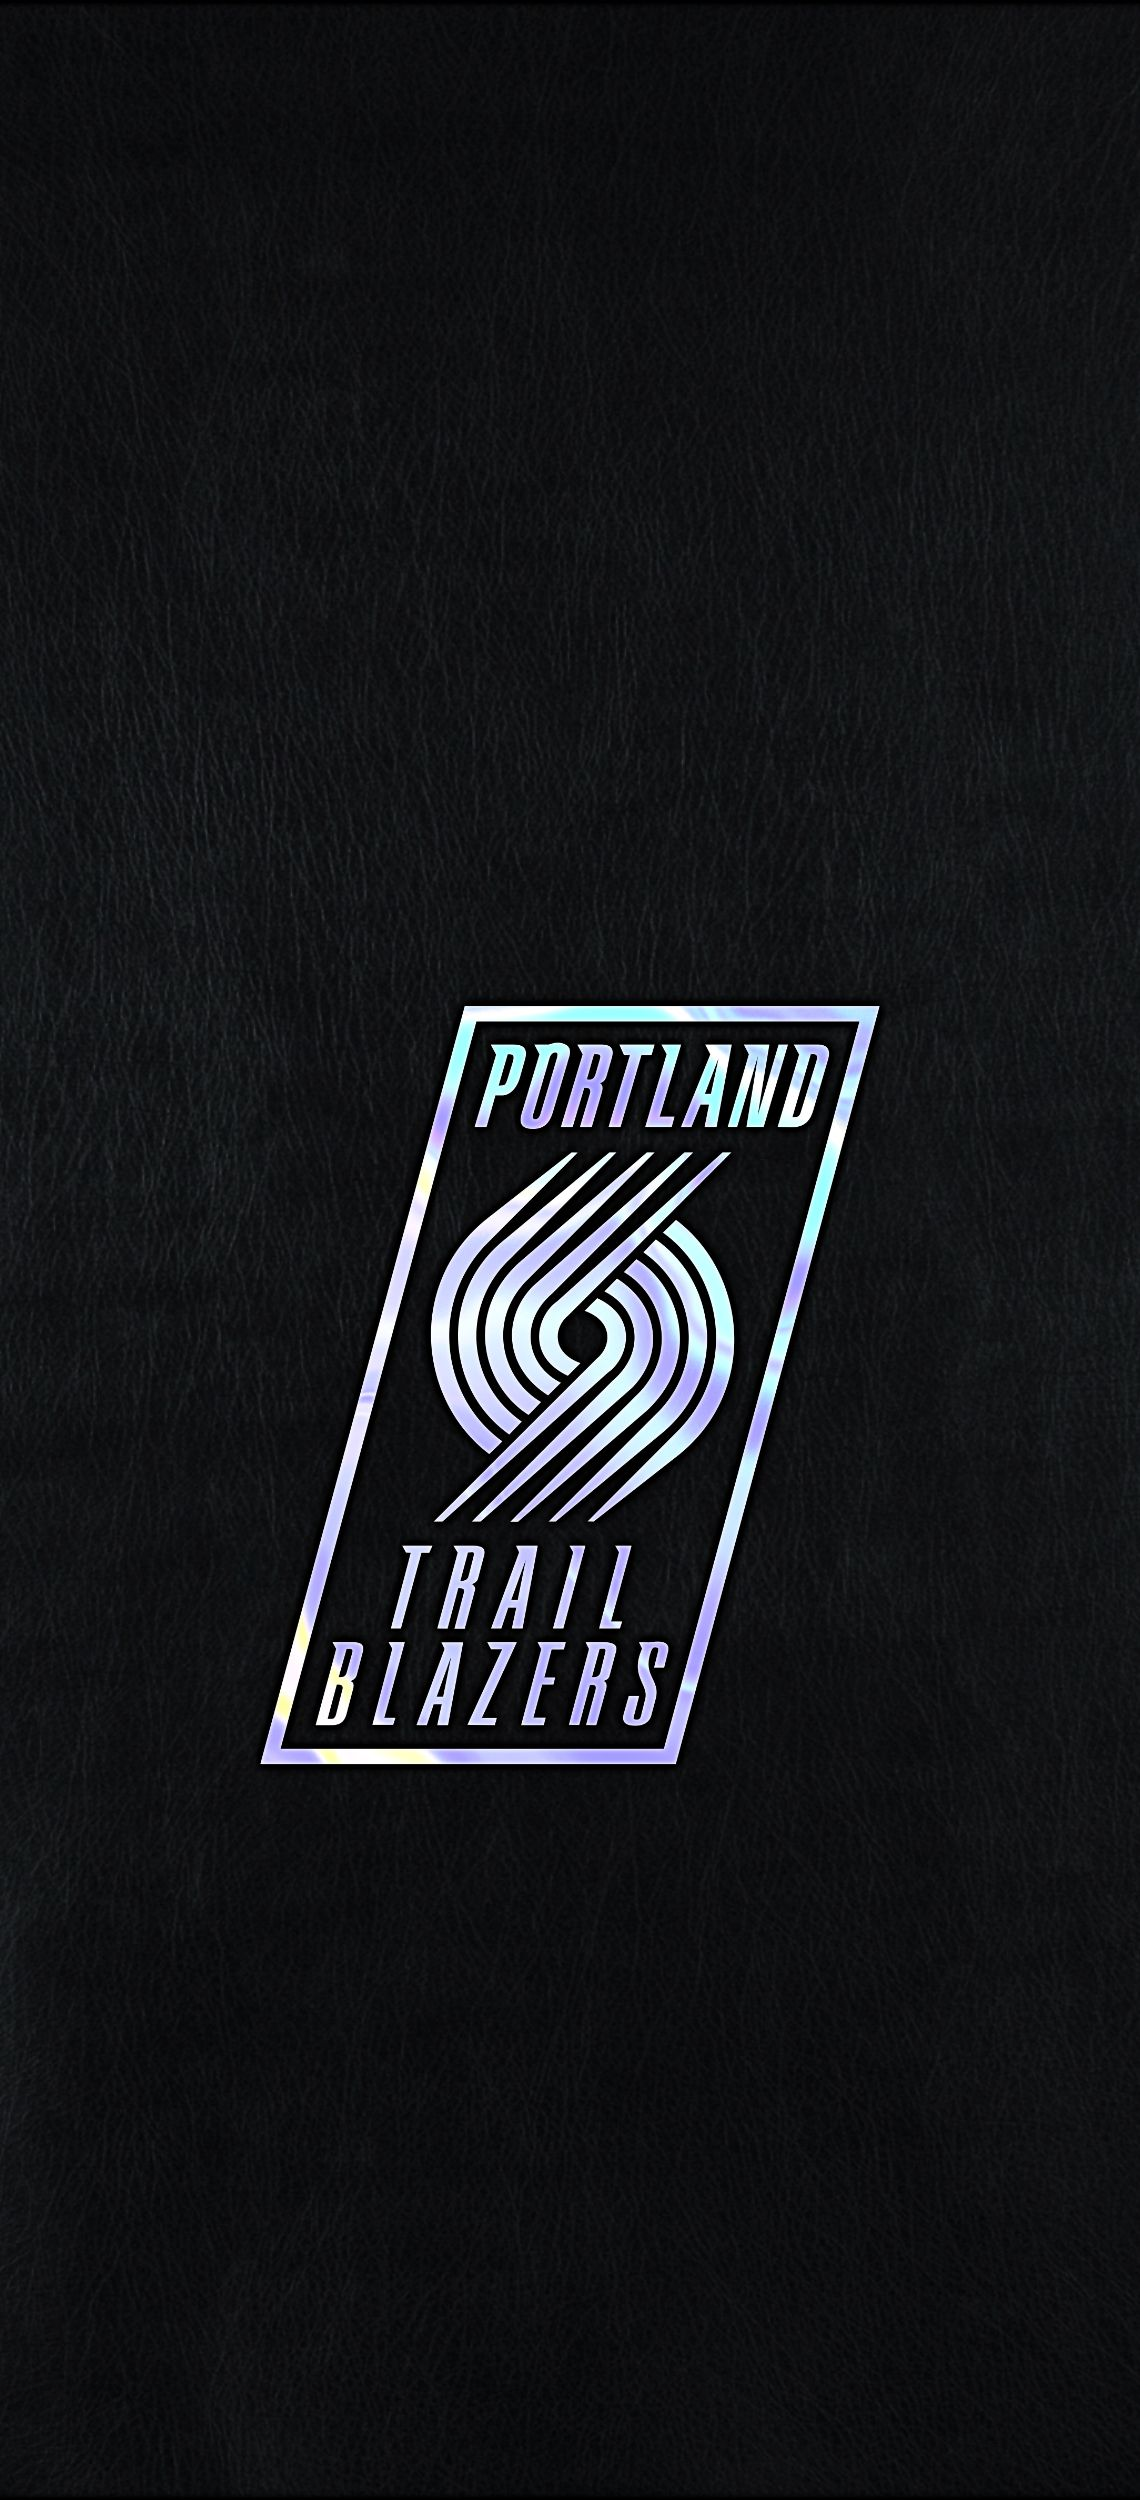 NBA Basketball Team Portland Trailblazers phone background